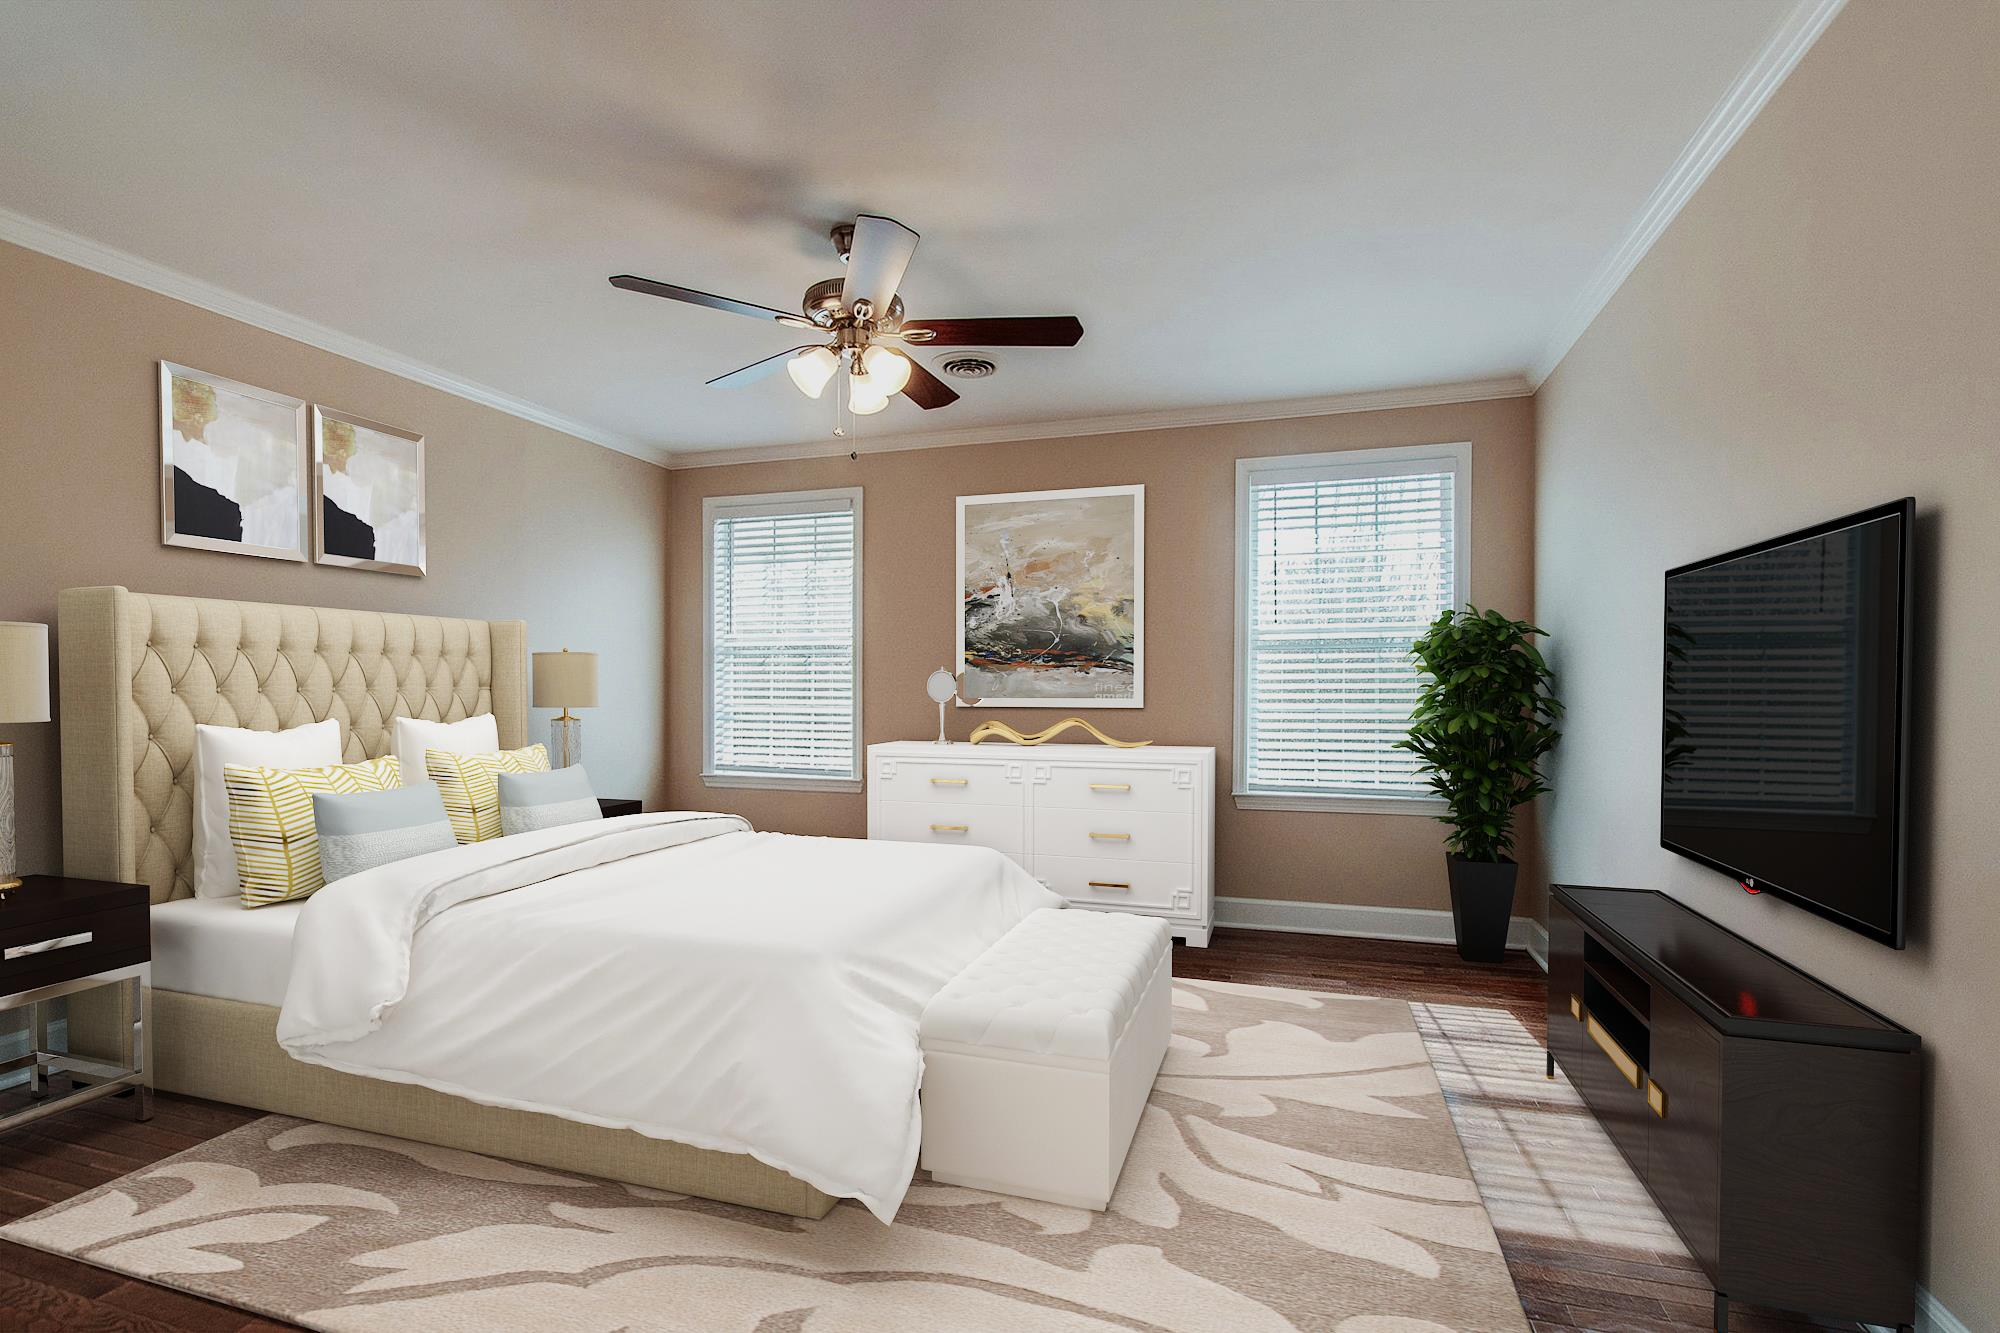 One of Bellevue 3 Bedroom Homes for Sale at 203 Bellevue Rd